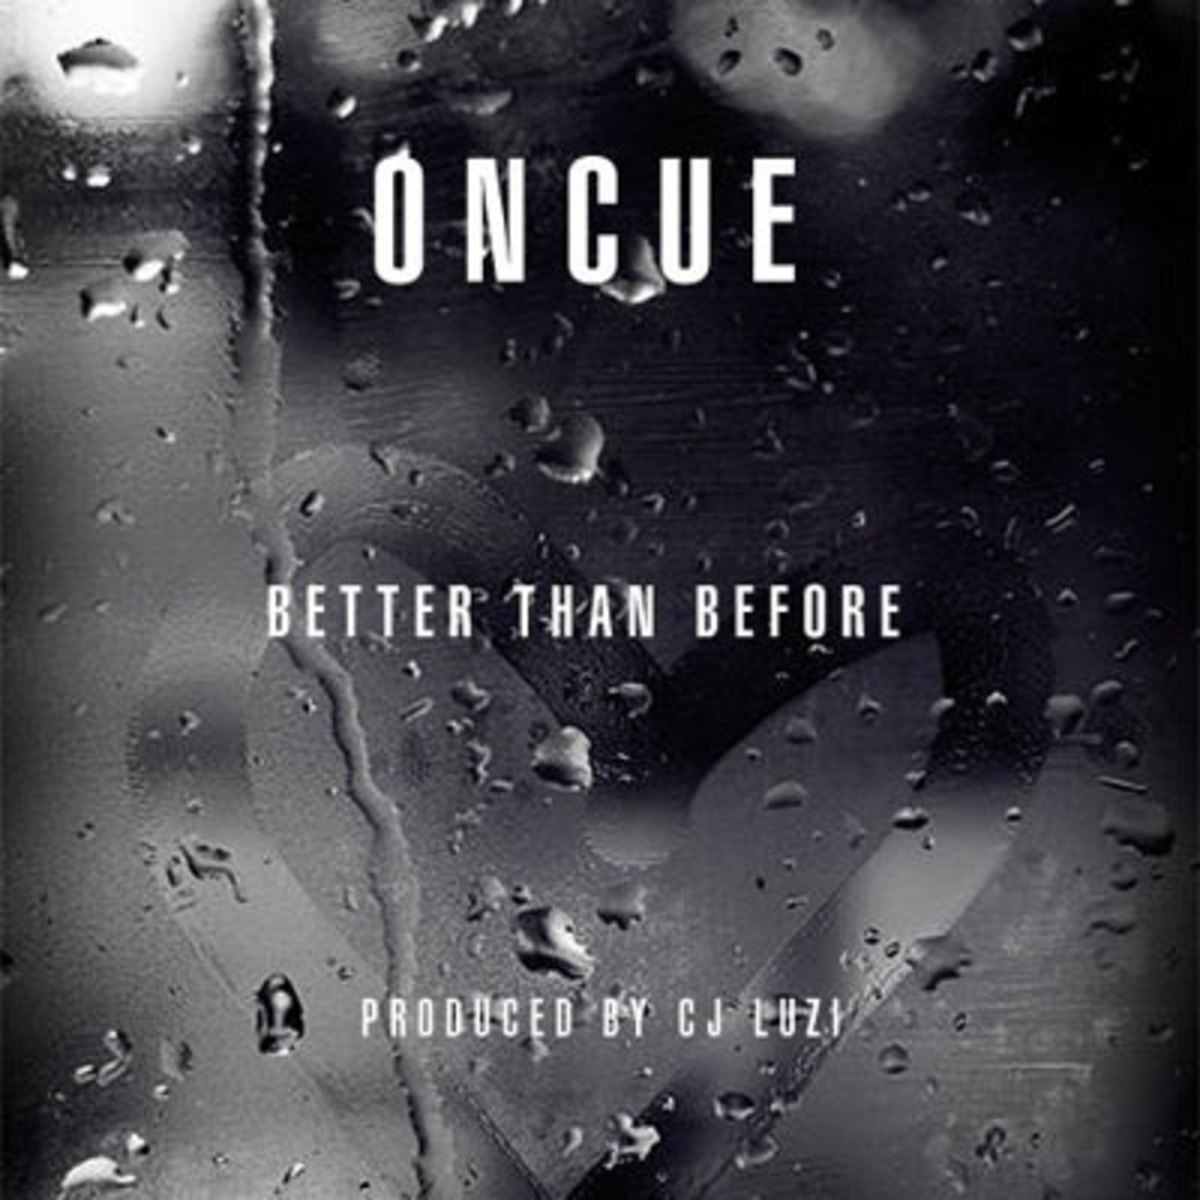 oncue-better.jpg